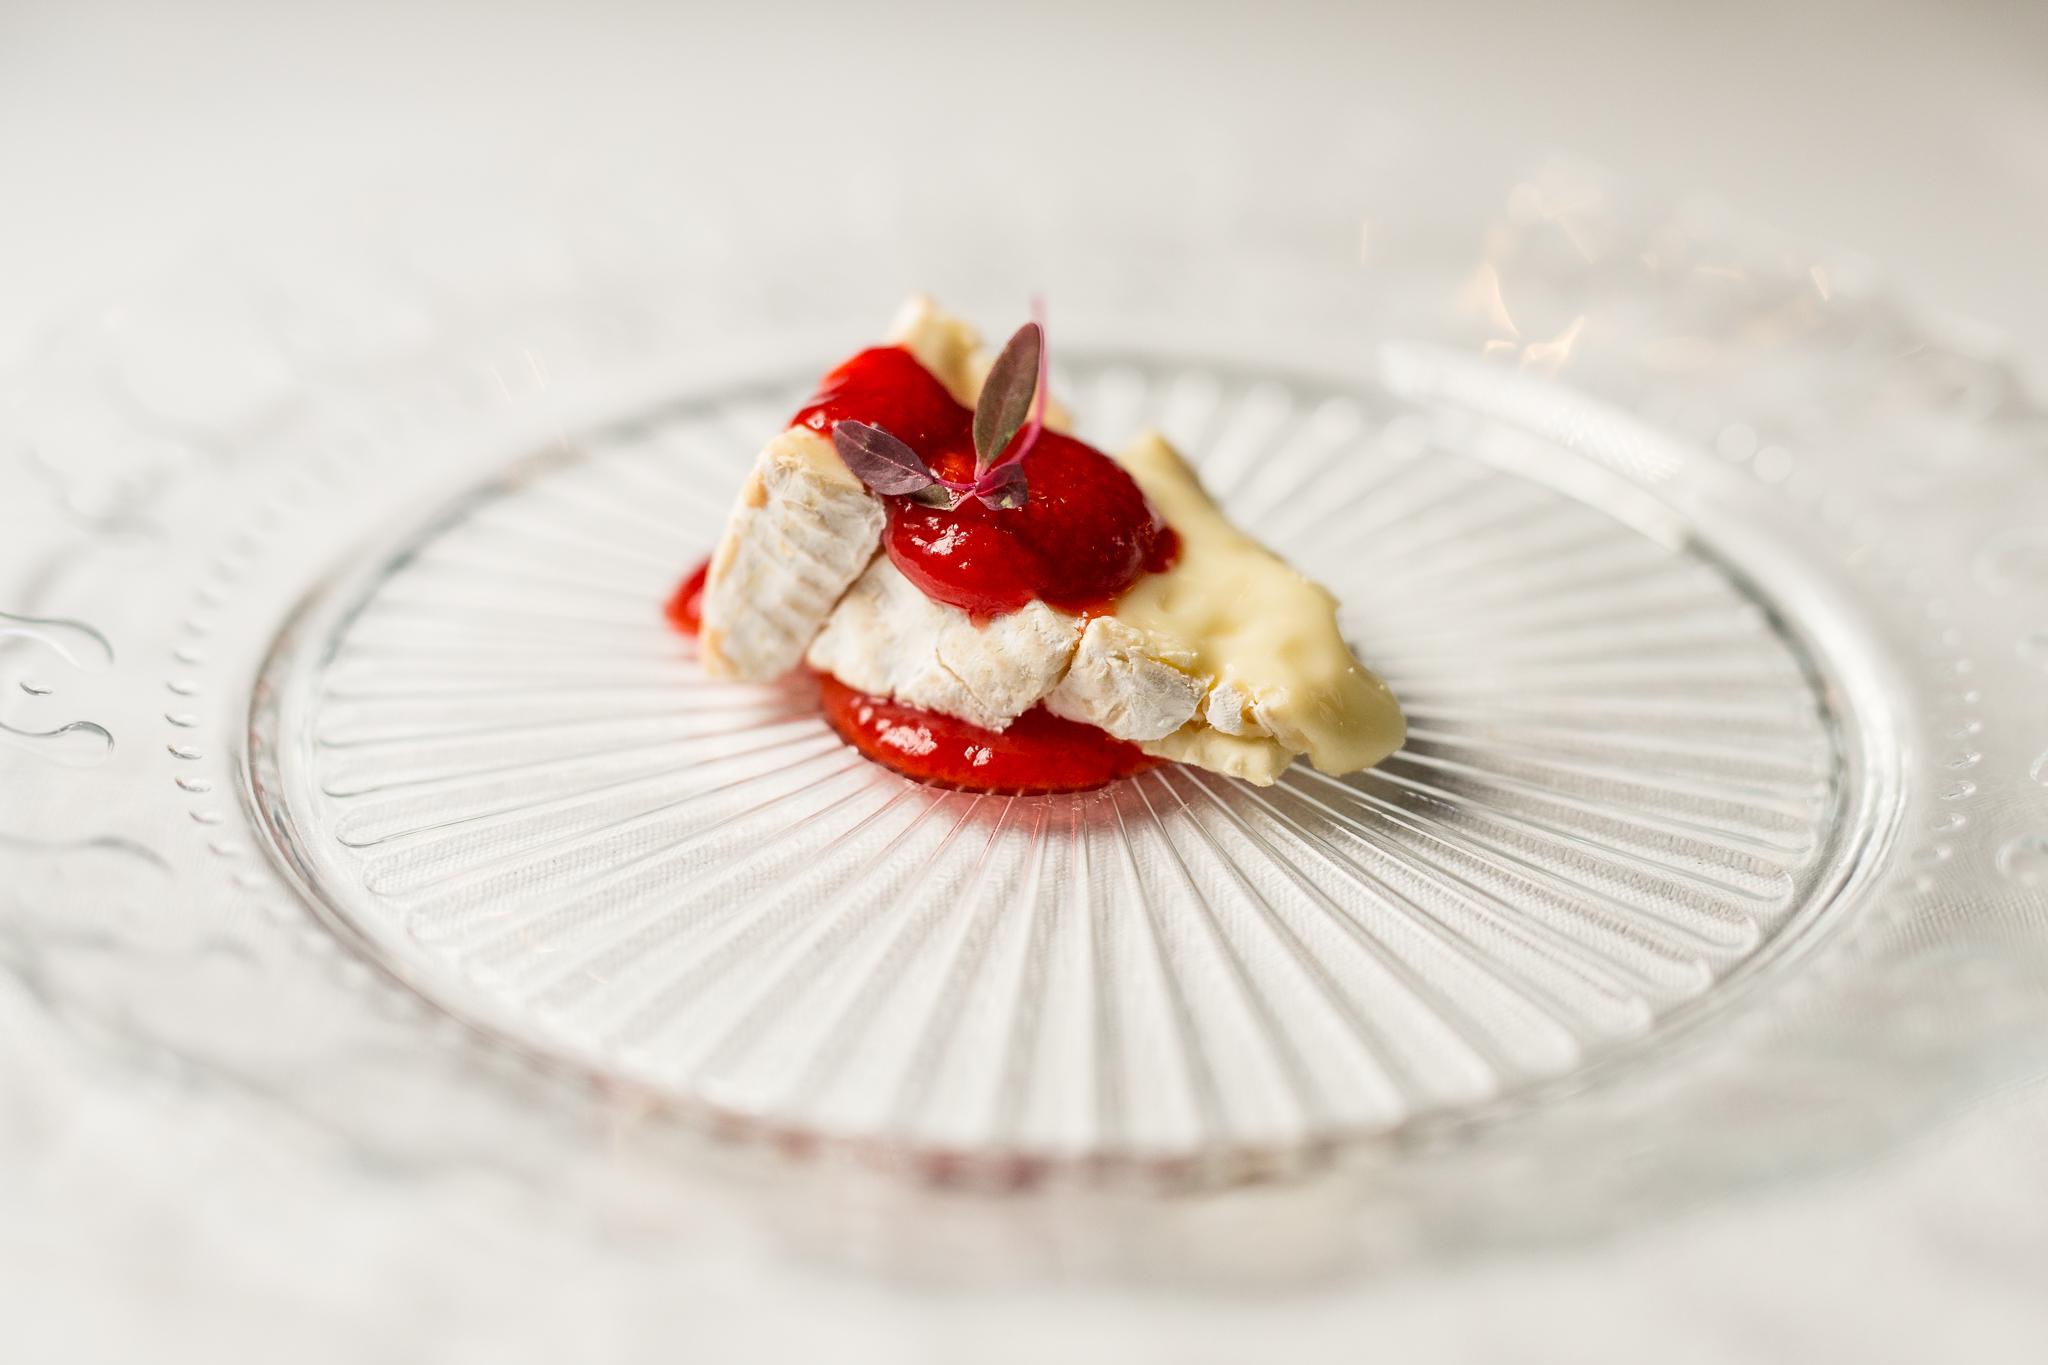 Camembert, Housemade Saltine, Chipotle Raspberry Jam